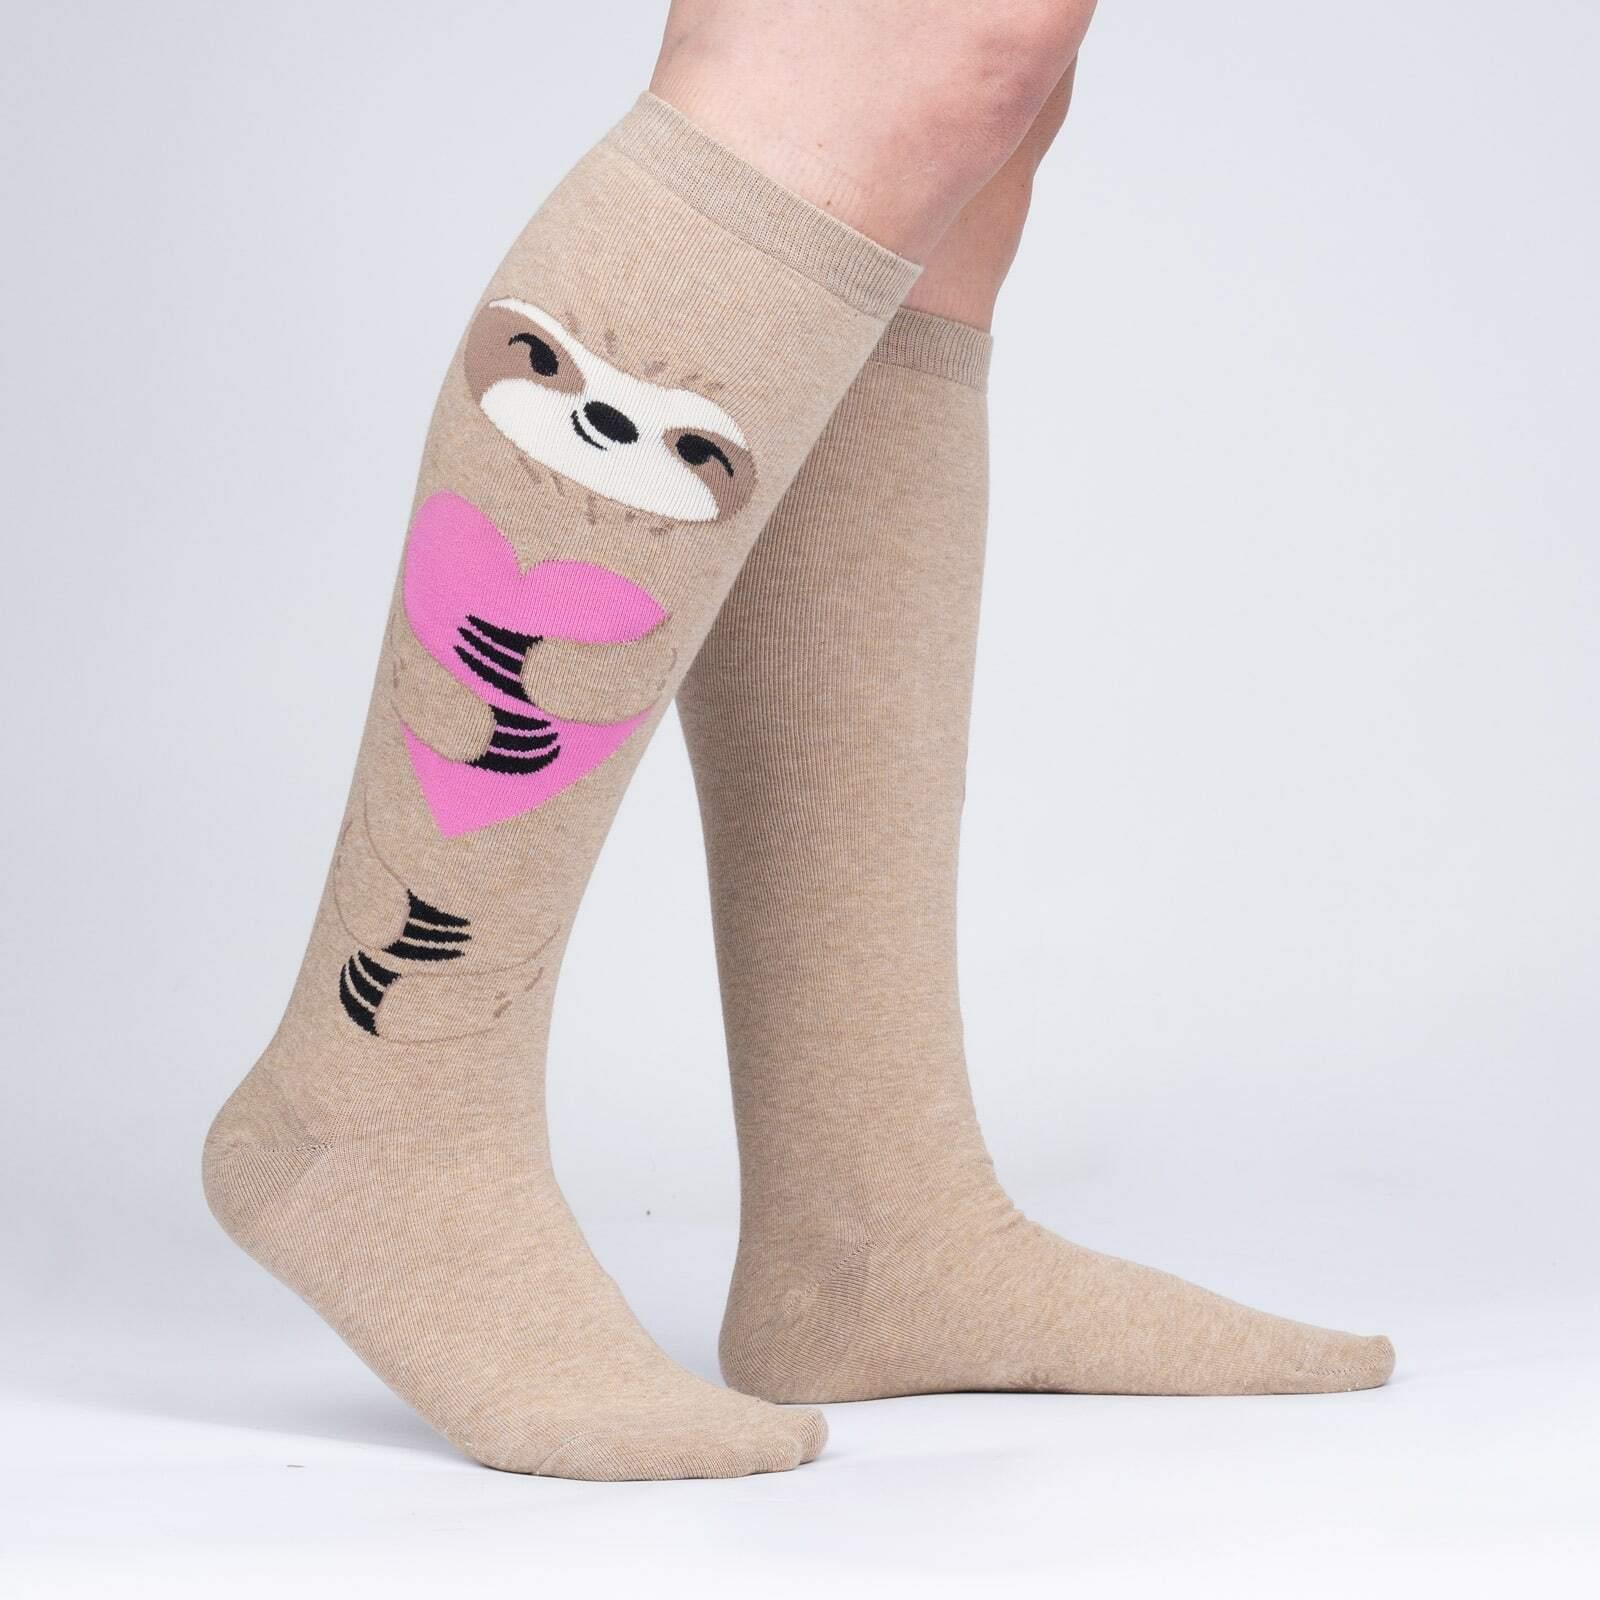 model side view of A Long Slow Hug - Heathered Sloth Socks - Unisex